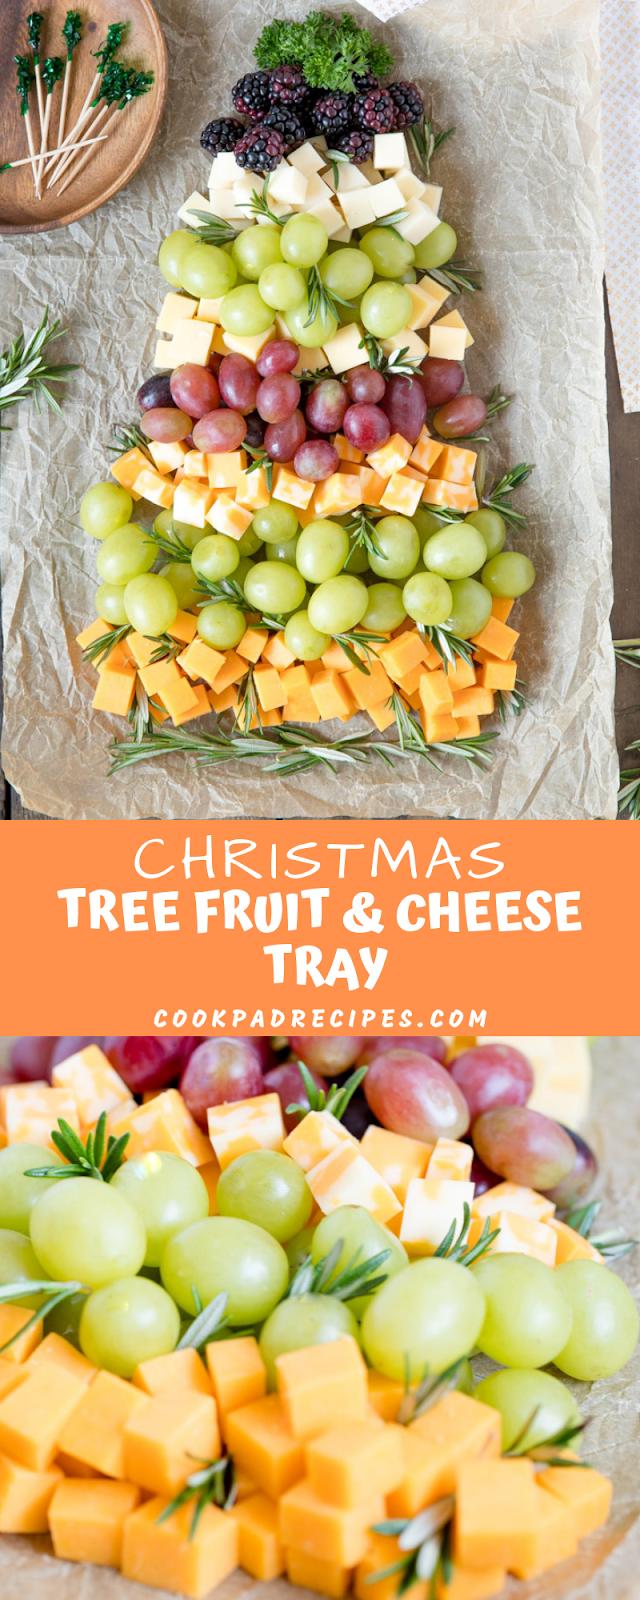 CHRISTMAS TREE FRUIT & CHEESE TRAY